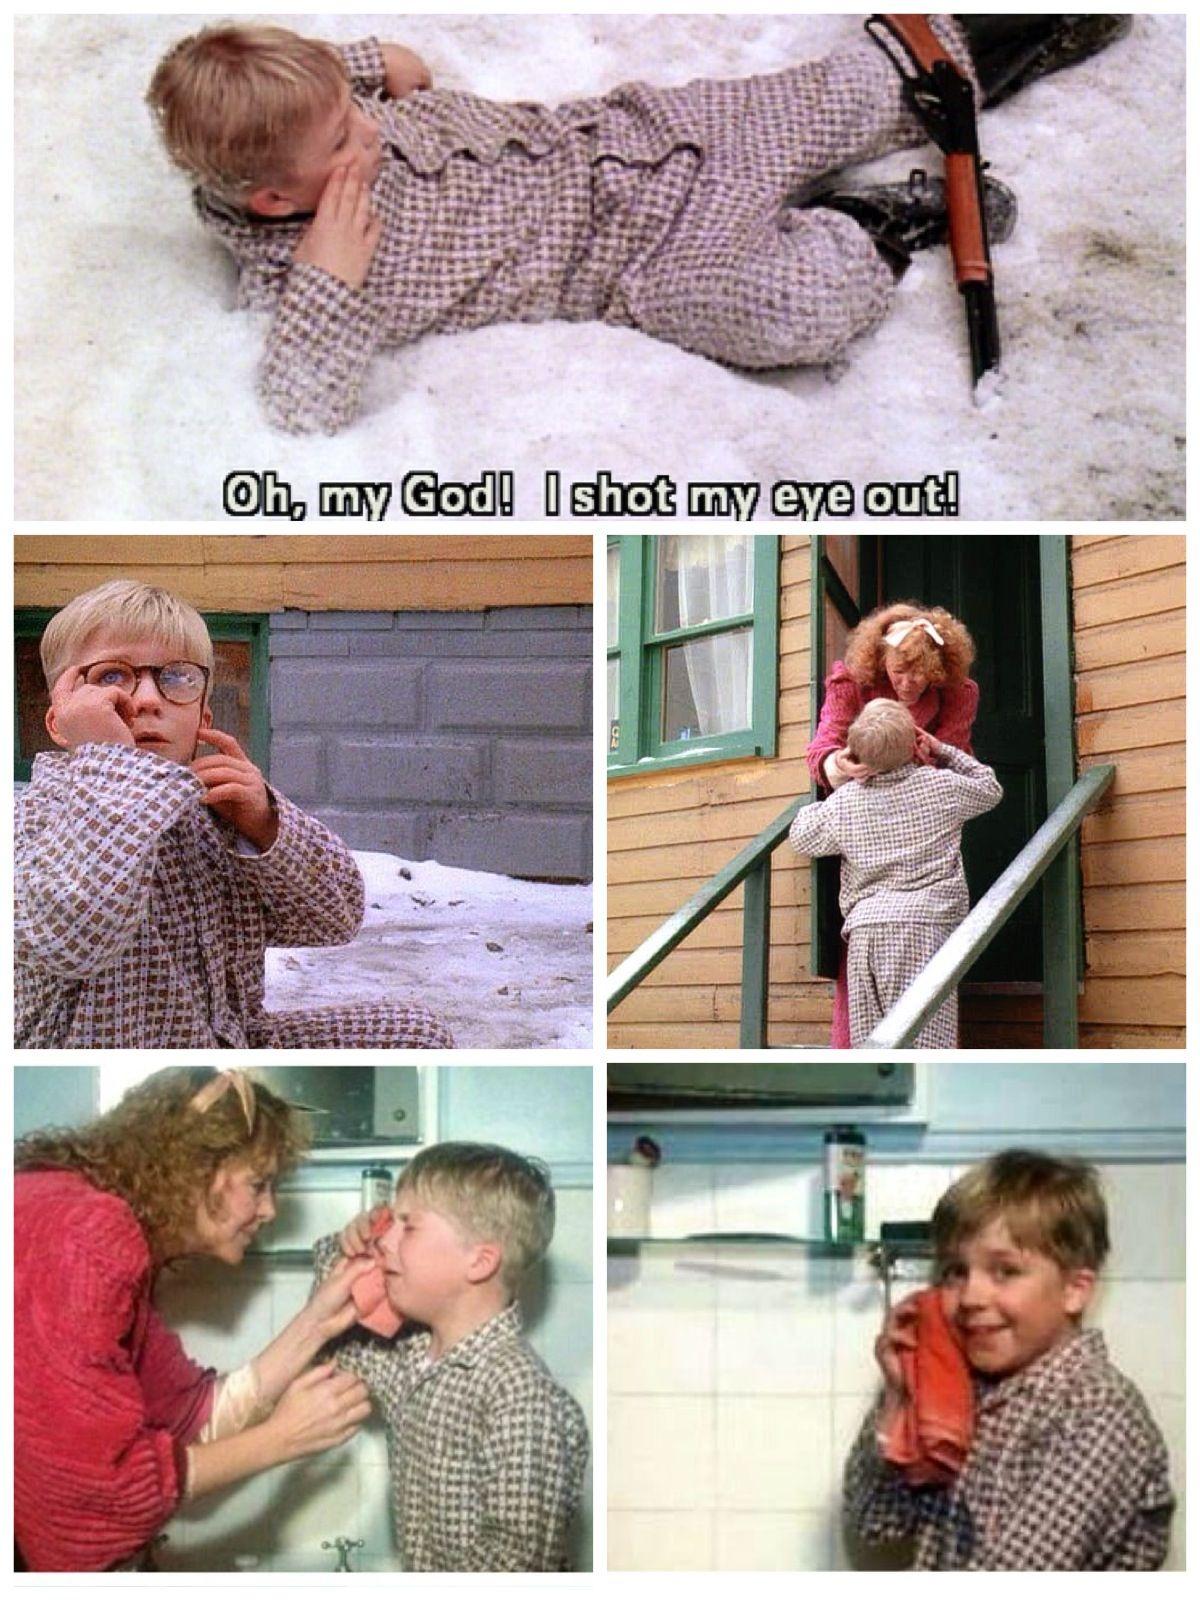 A Christmas Story 1983 - Ralphie fake crying